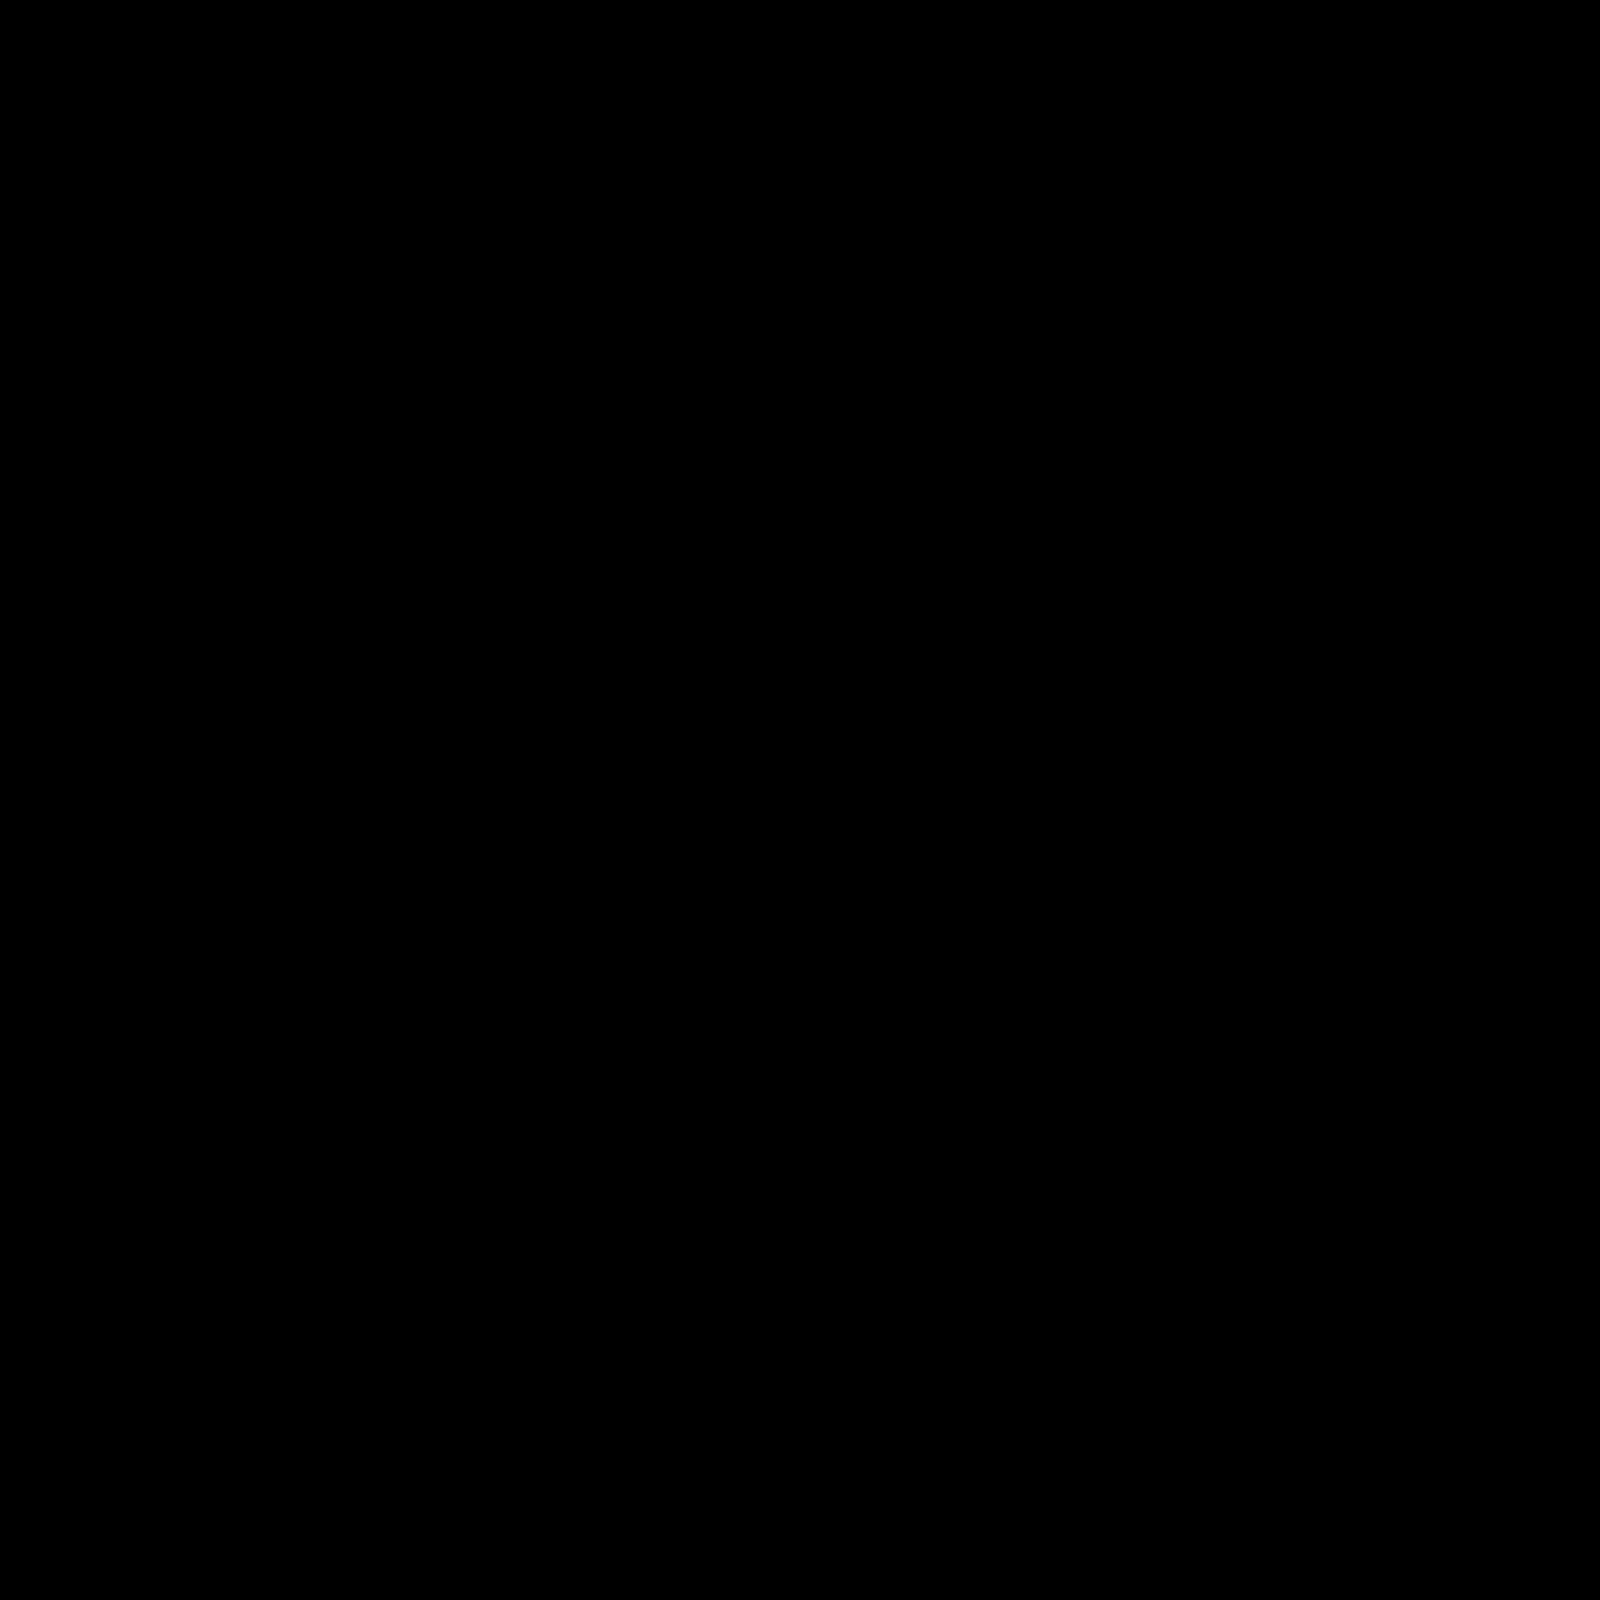 Cavo audio icon